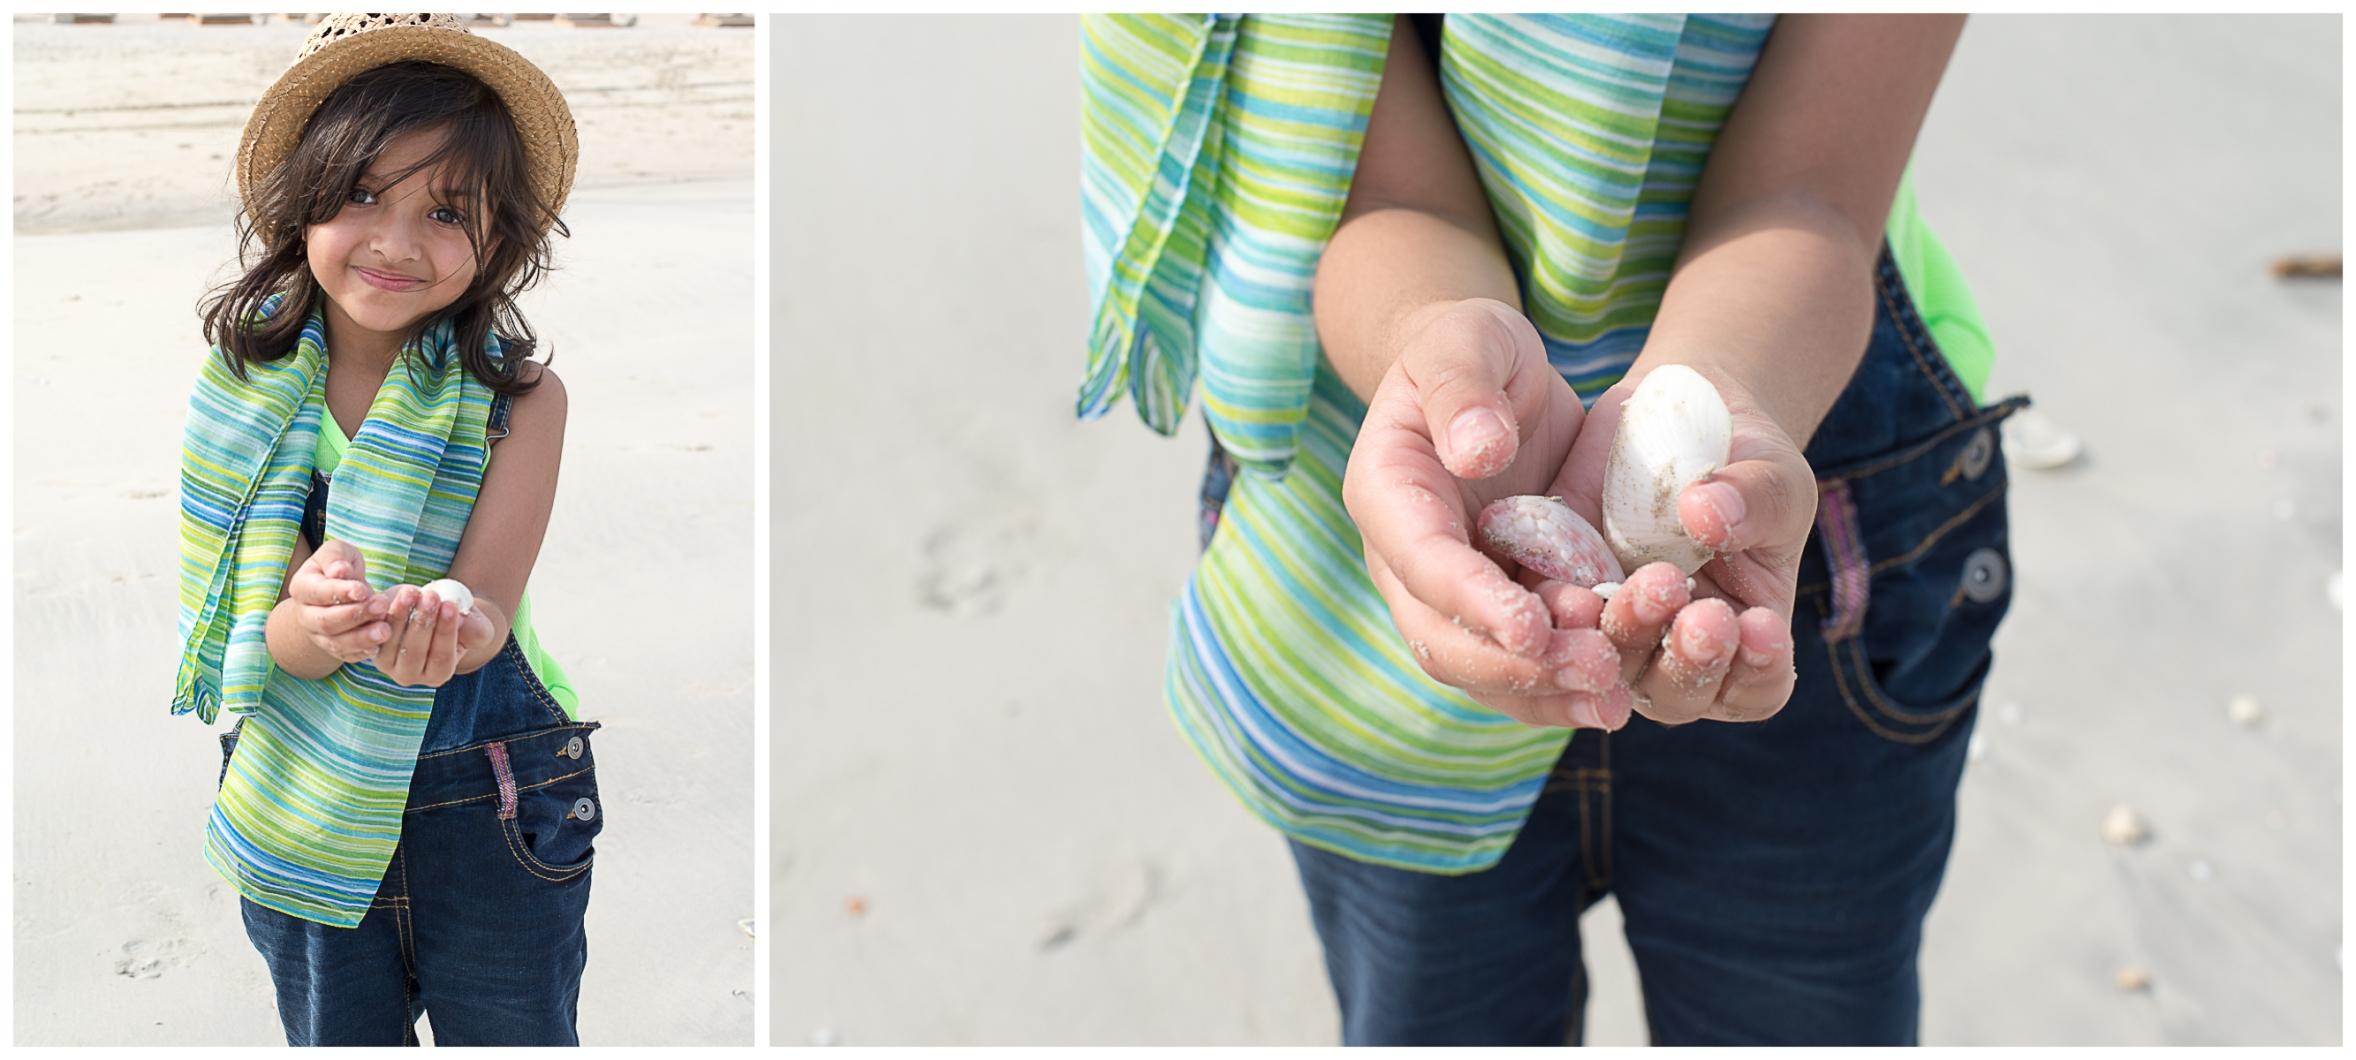 Collecting shells on JBR beach